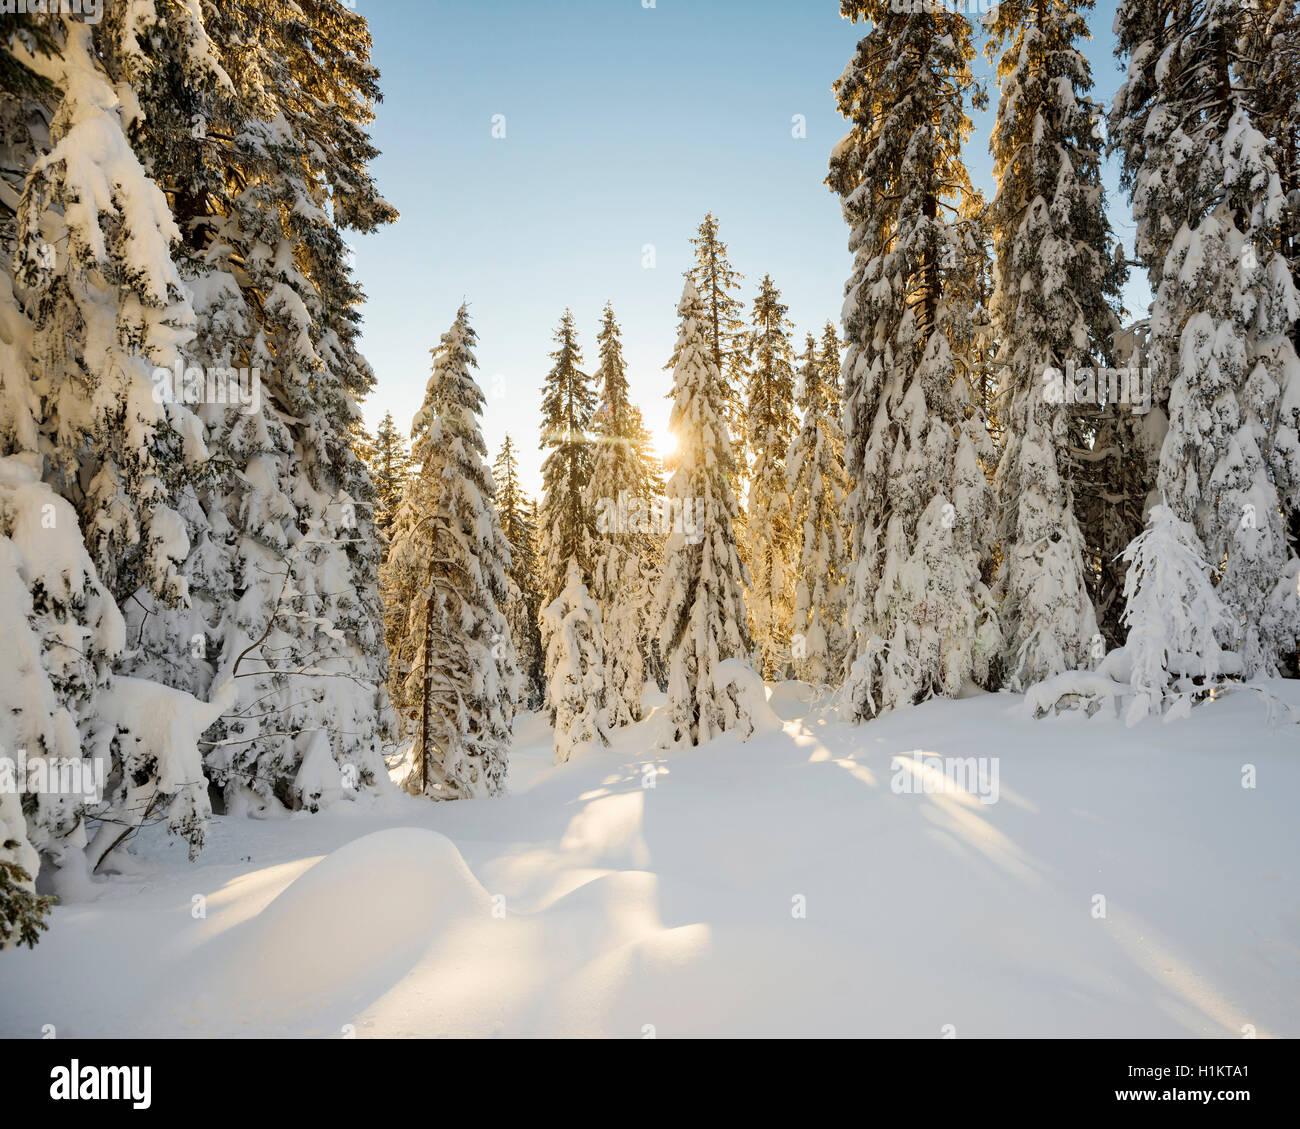 Sun shining through snow covered spruce trees, Feldberg, Black Forest, Baden-Württemberg, Germany Stock Photo